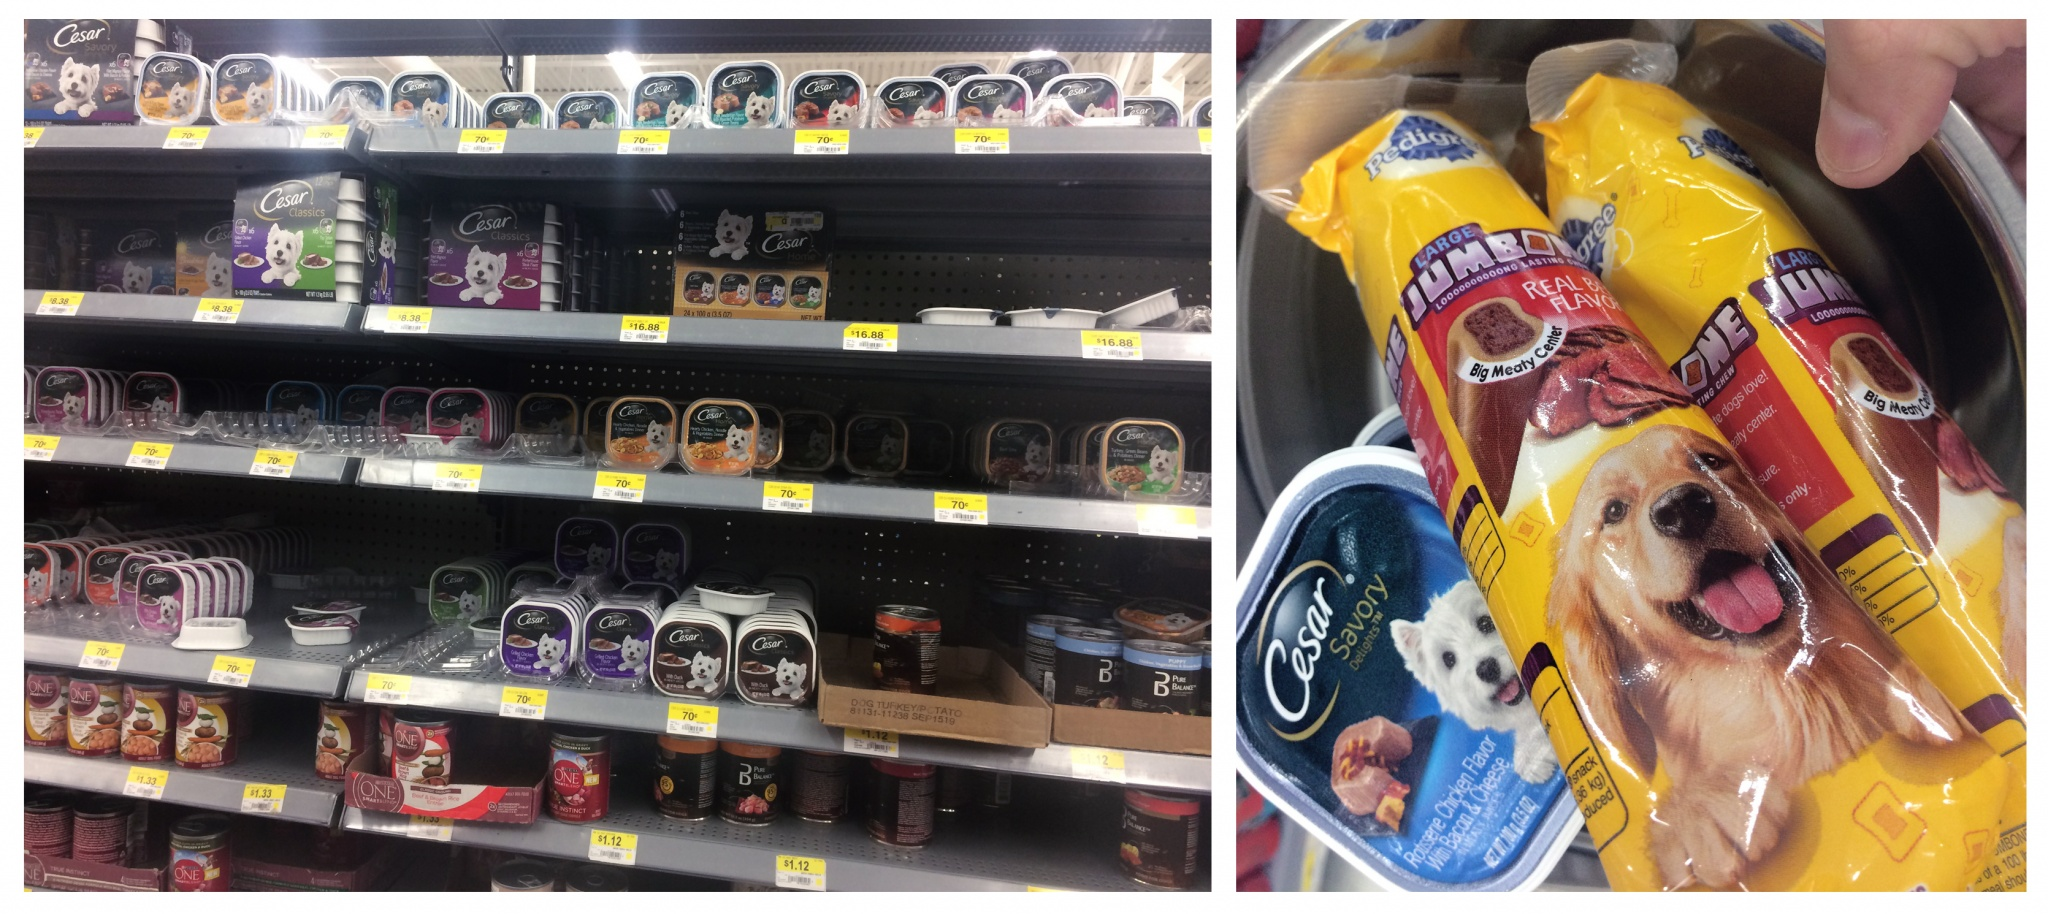 Walmart_Pedugree2